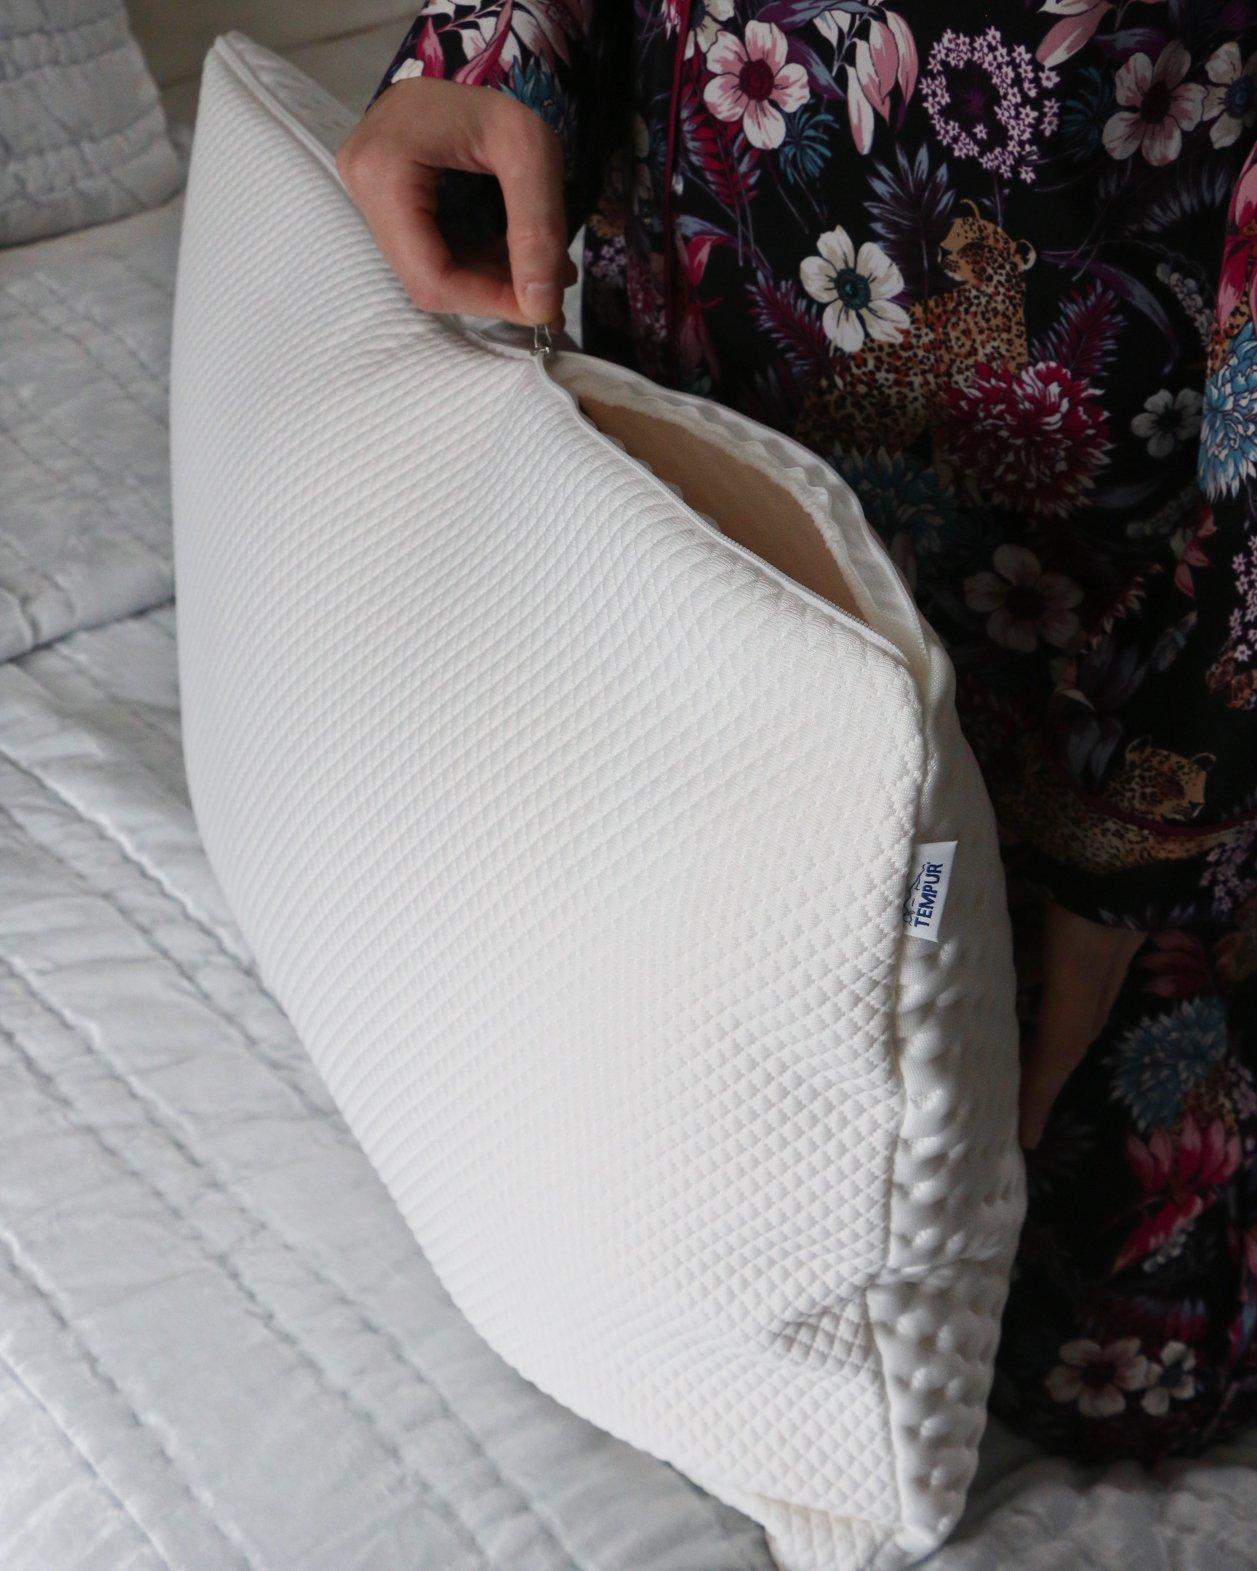 tempur pillow removable cover